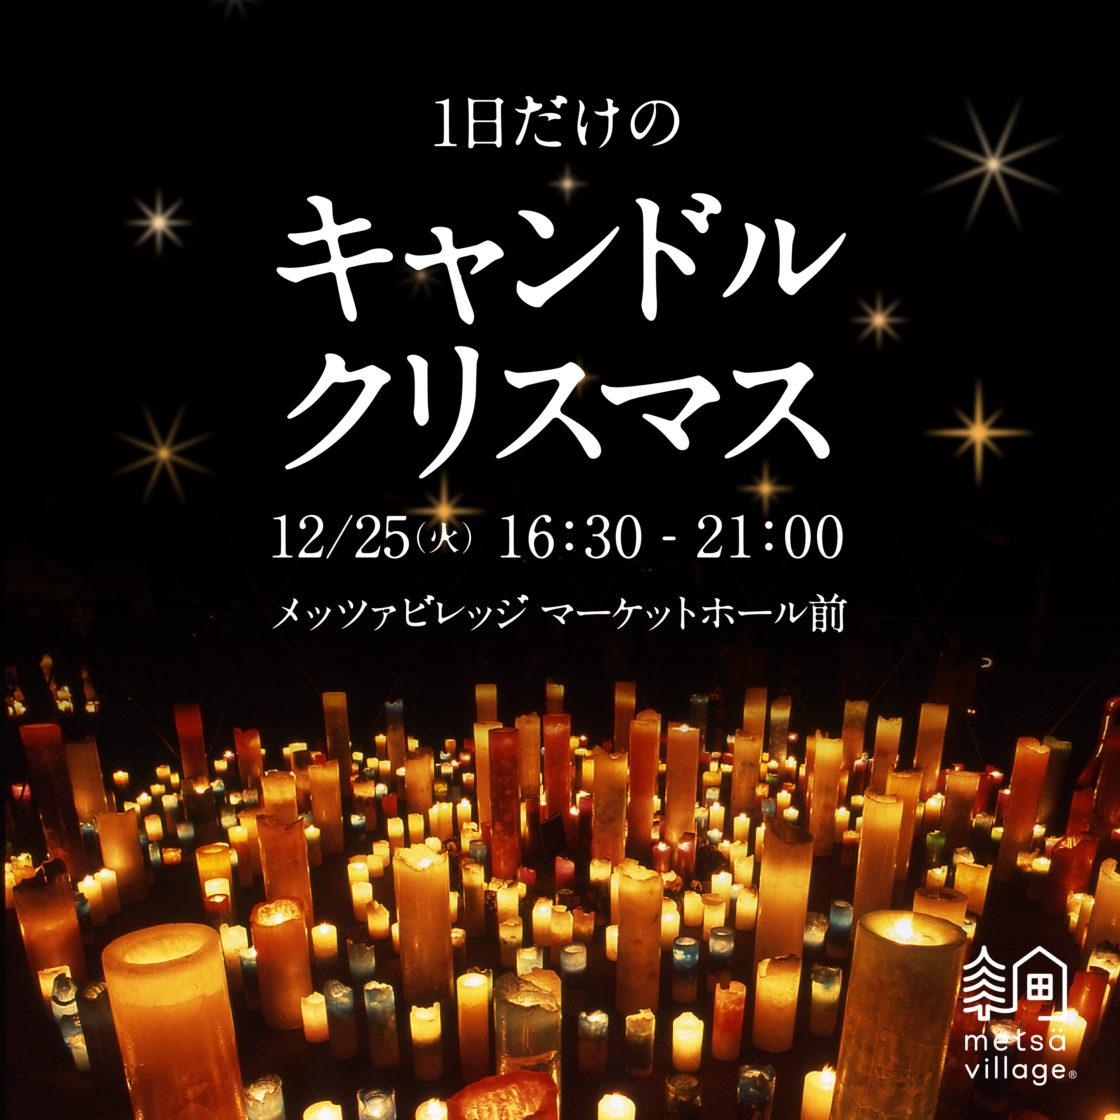 1 day candle Christmas 1